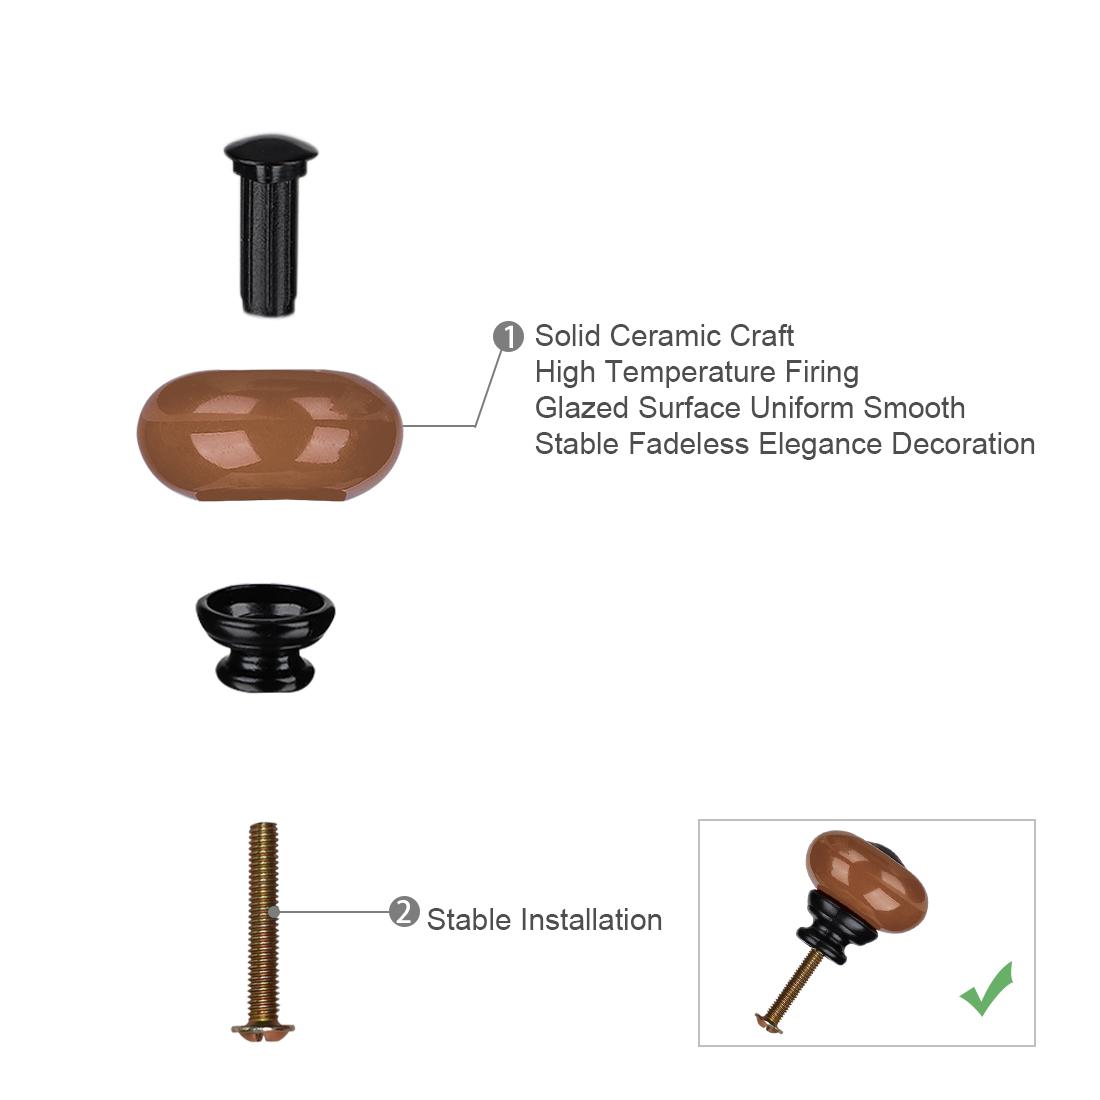 Ceramic Knob Pull Handle Furniture Dresser Wardrobe Cabinet Accessory 8pcs Brown - image 1 de 8